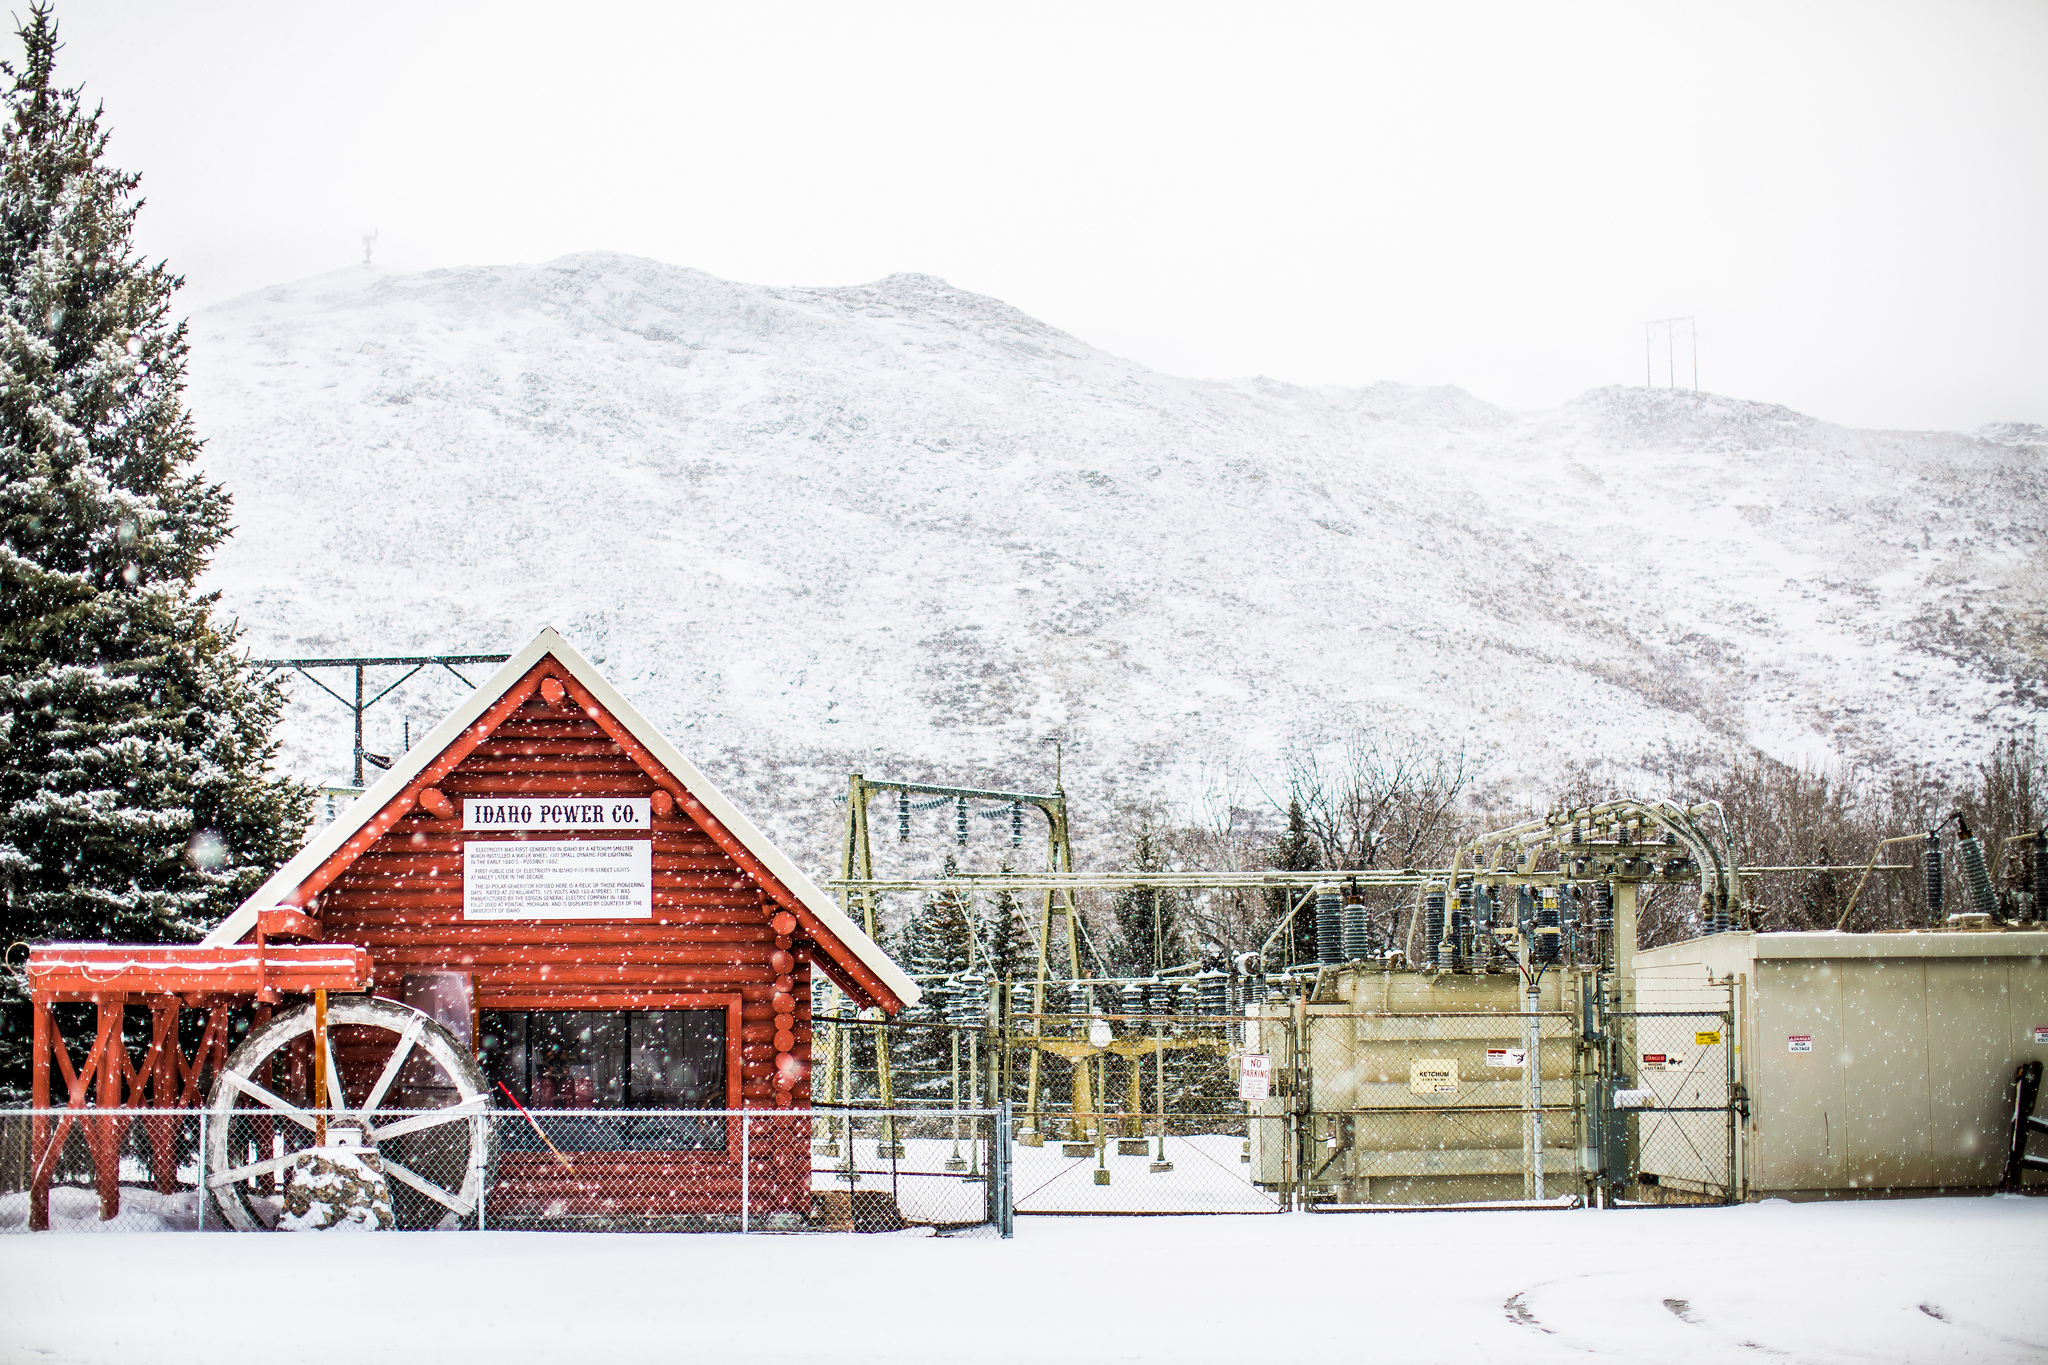 19 Breathtaking Photos of Idaho in Winter